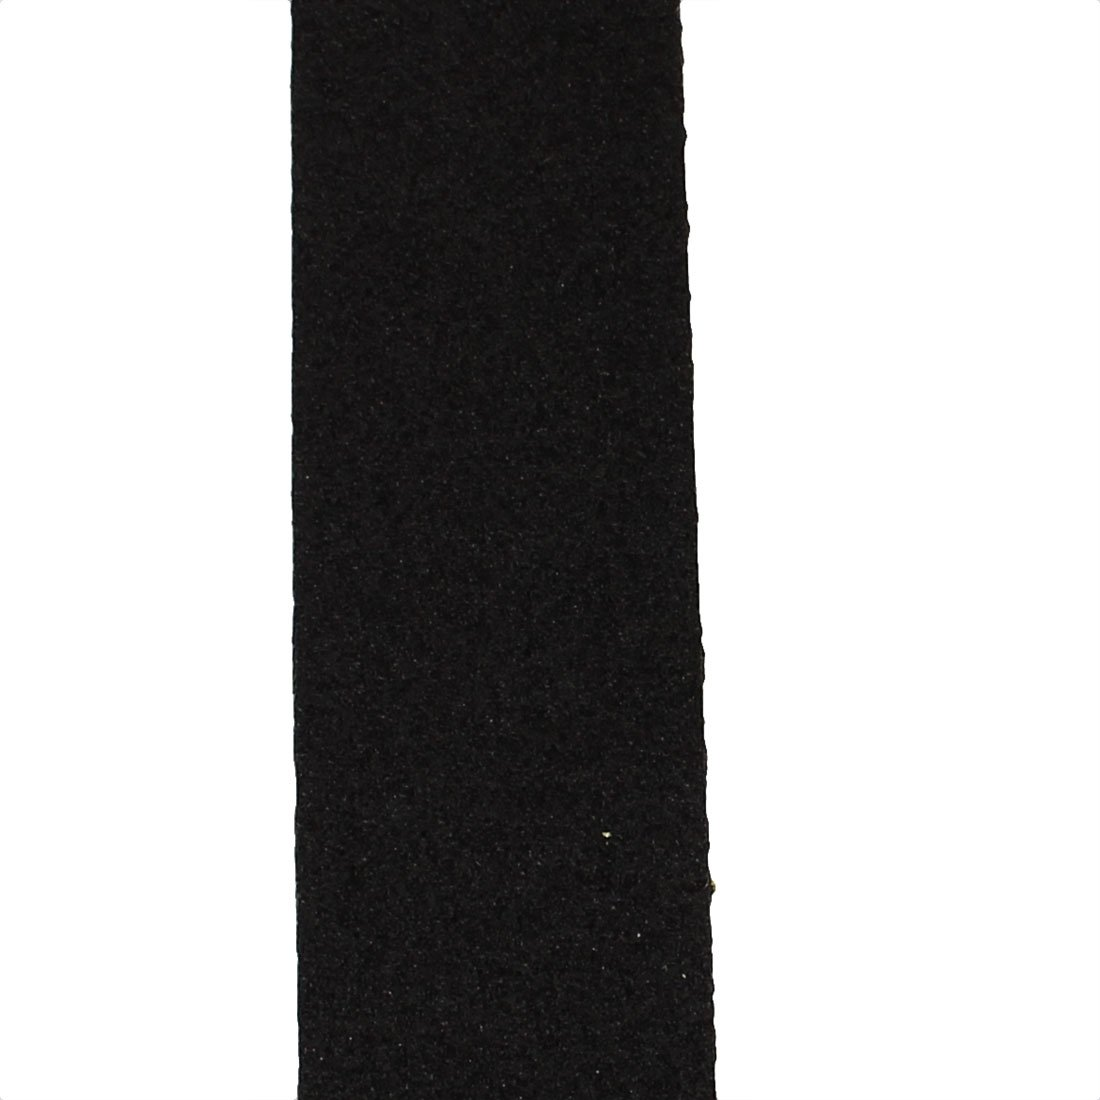 sourcing map 20mm x 4mm Gelb Sto/ßfest Schwamm Einseitig Klebend Schaum Band 3 Meter DE de